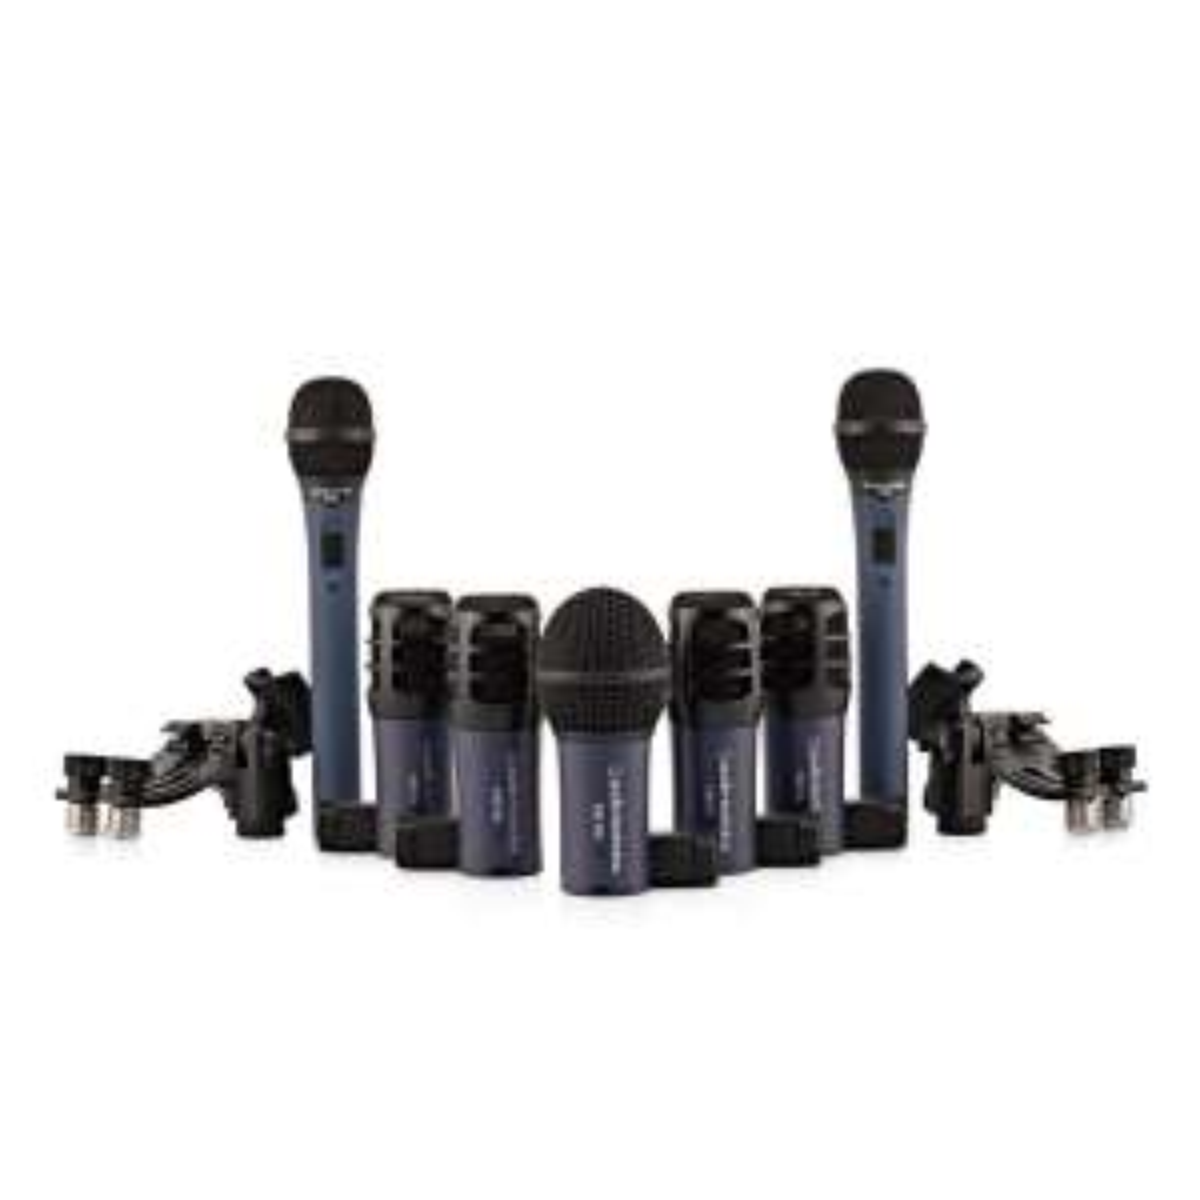 Audio Technica MB/DK7 drum microphone set (7 pieces) £199 @ Gear4music